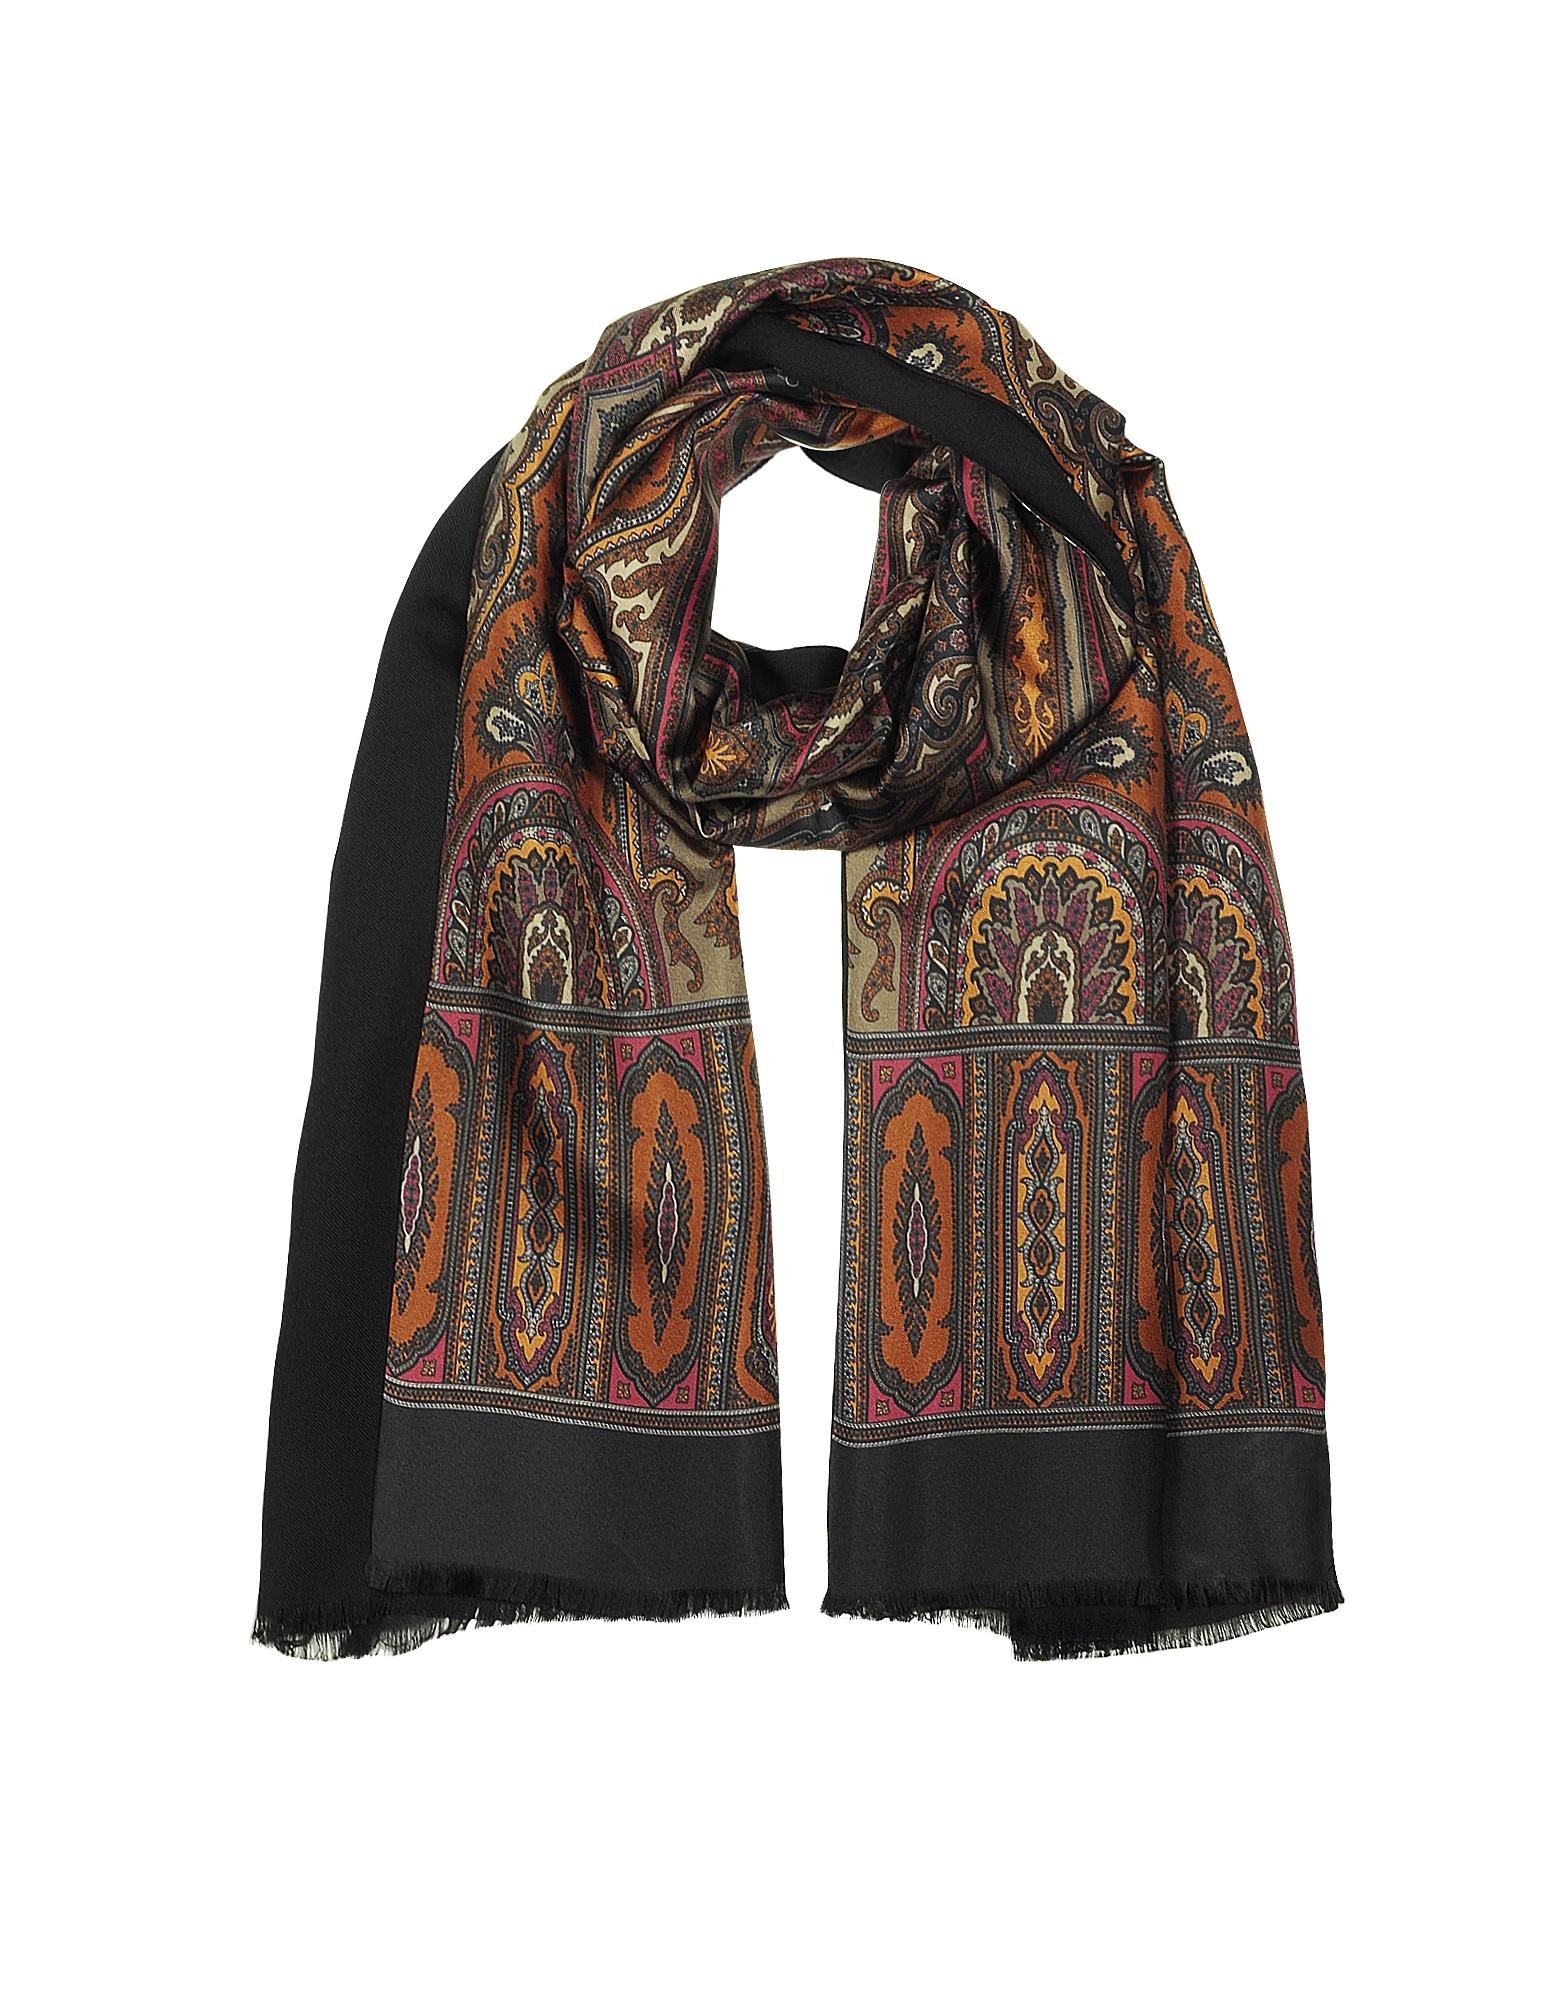 Modal & Silk Ornamental Print Men's Fringed Scarf, Brown / black